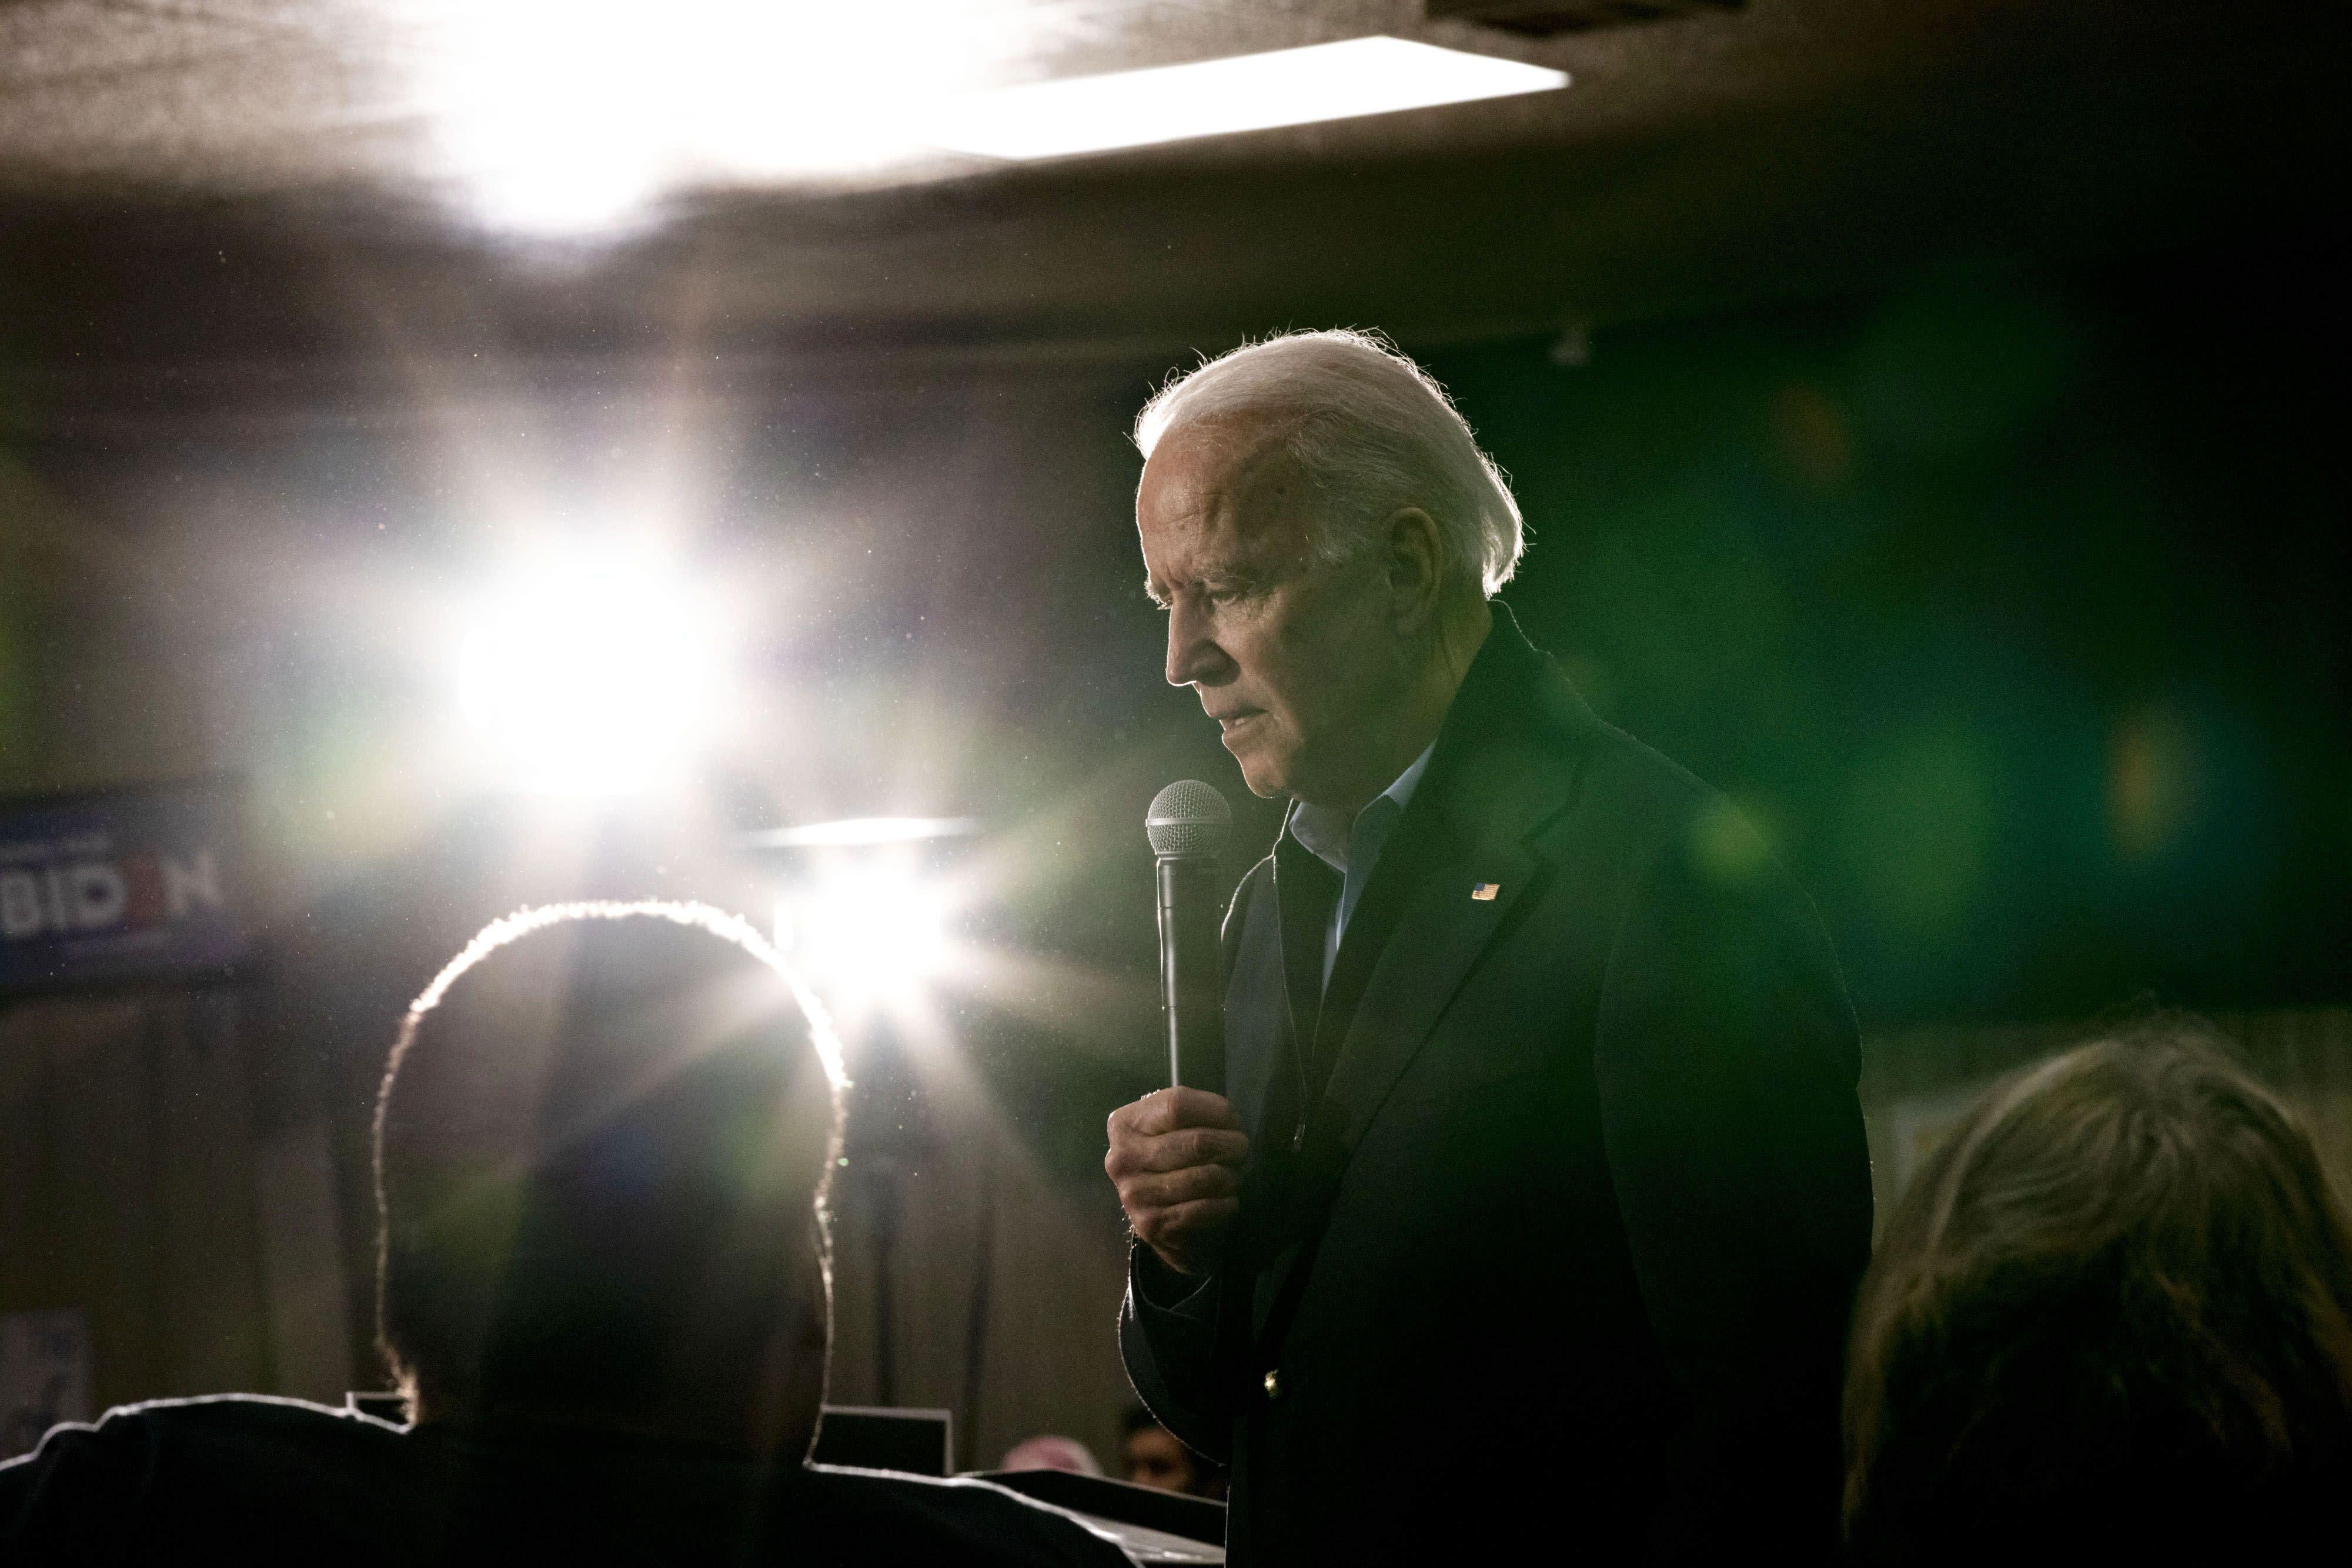 Joe Bide's testy response to NBC question about Hunter's dealings in Ukraine